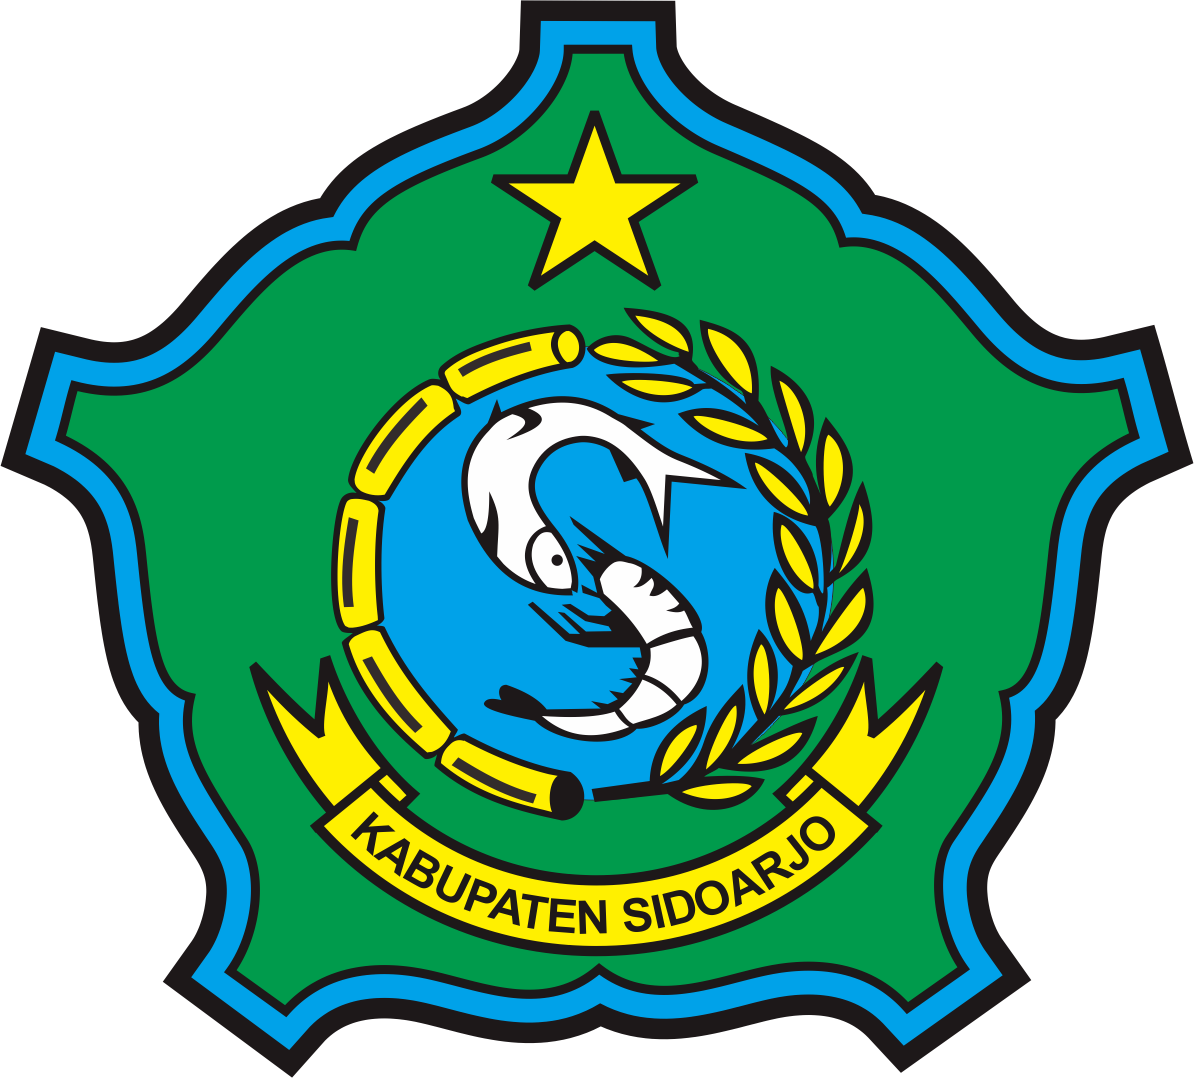 Kabupaten Sidoarjo Wikipedia Bahasa Indonesia Ensiklopedia Bebas Wisata Kampung Sepatu